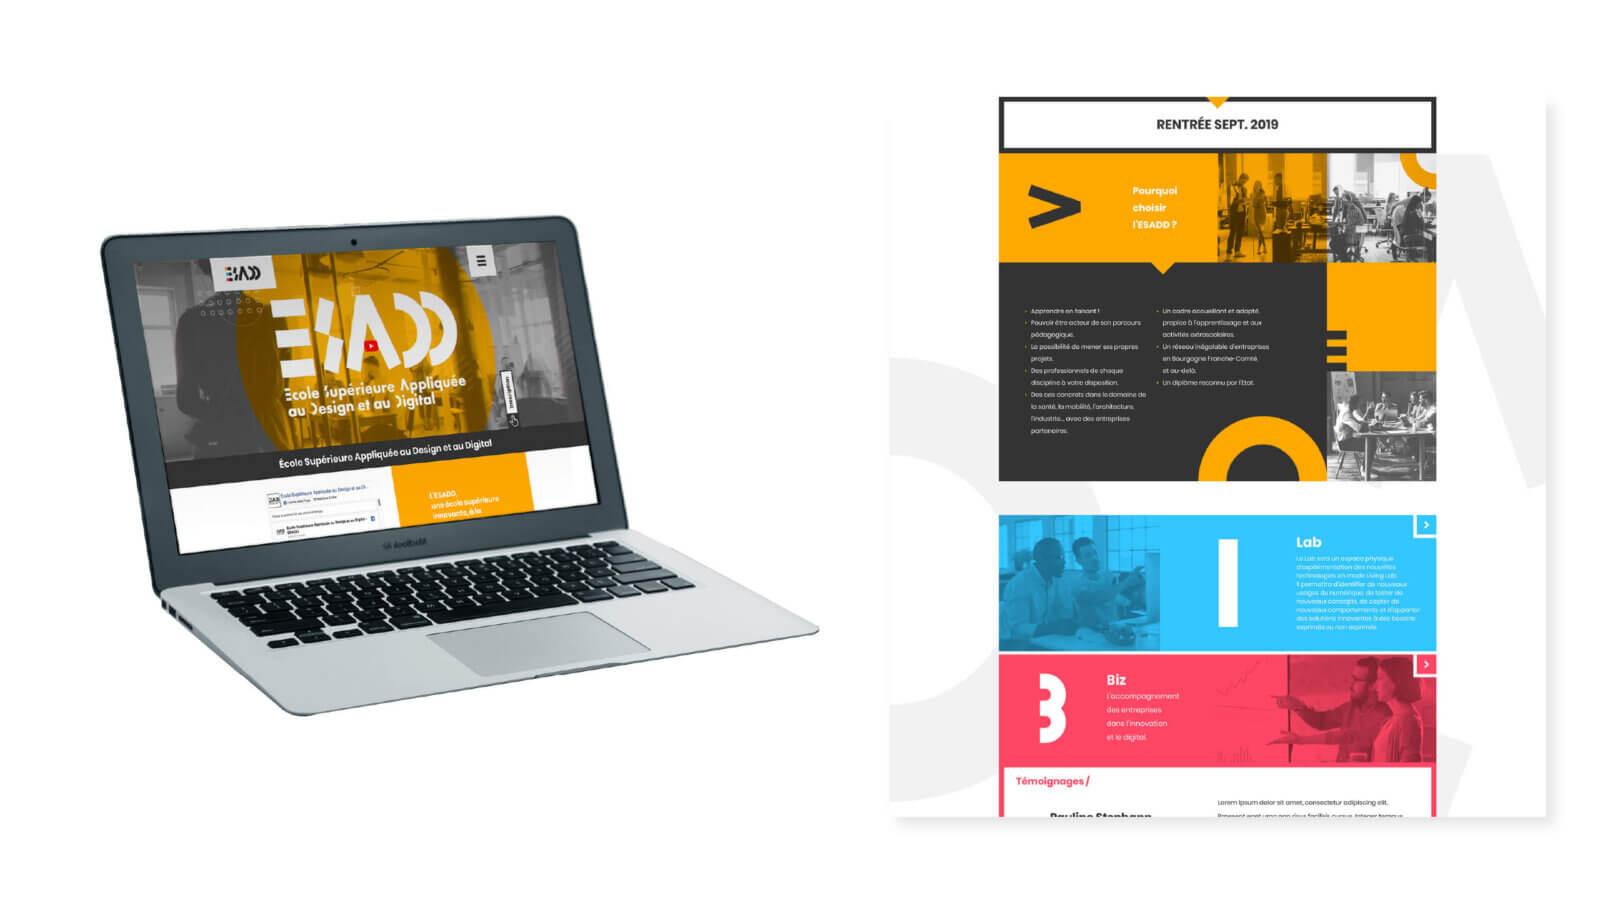 homepage du site vitrine de l'esadd